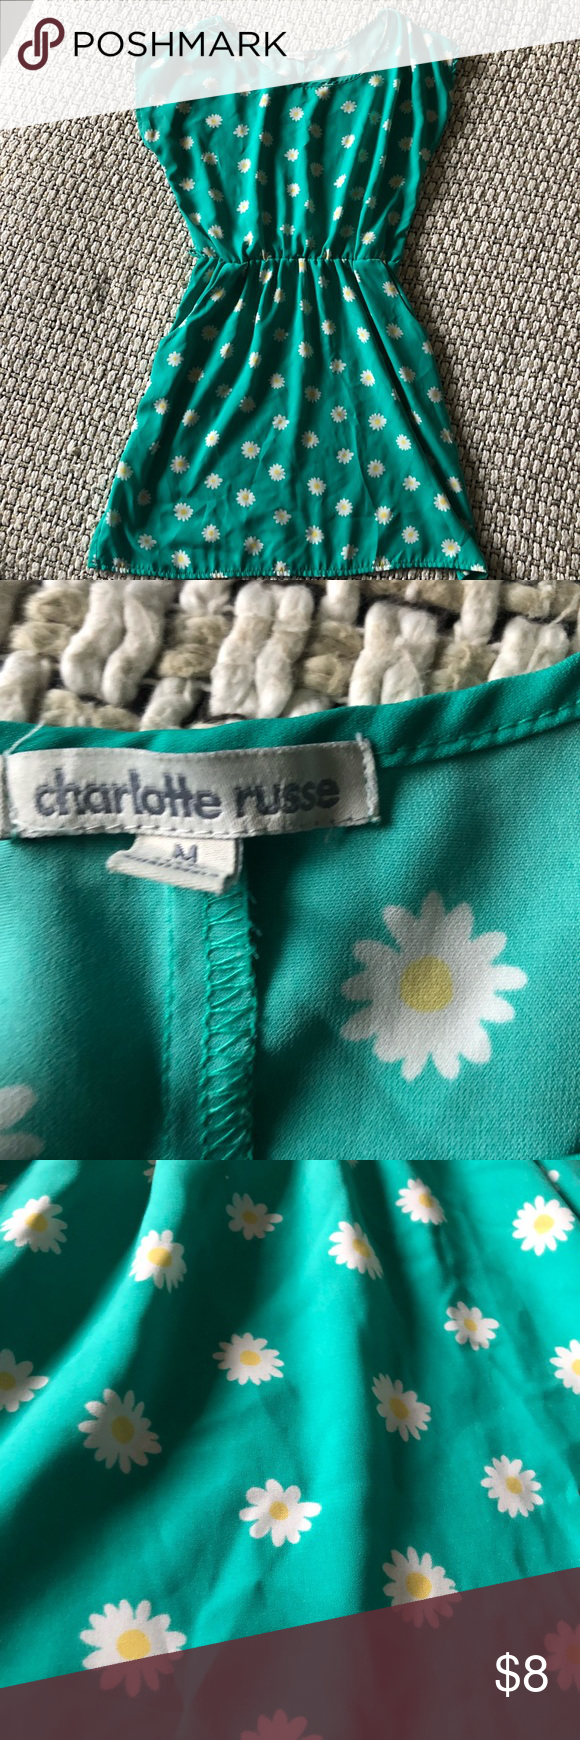 Charlotte Russe flower dress Cute teal flower dress, missing belt. Charlotte Russe Dresses